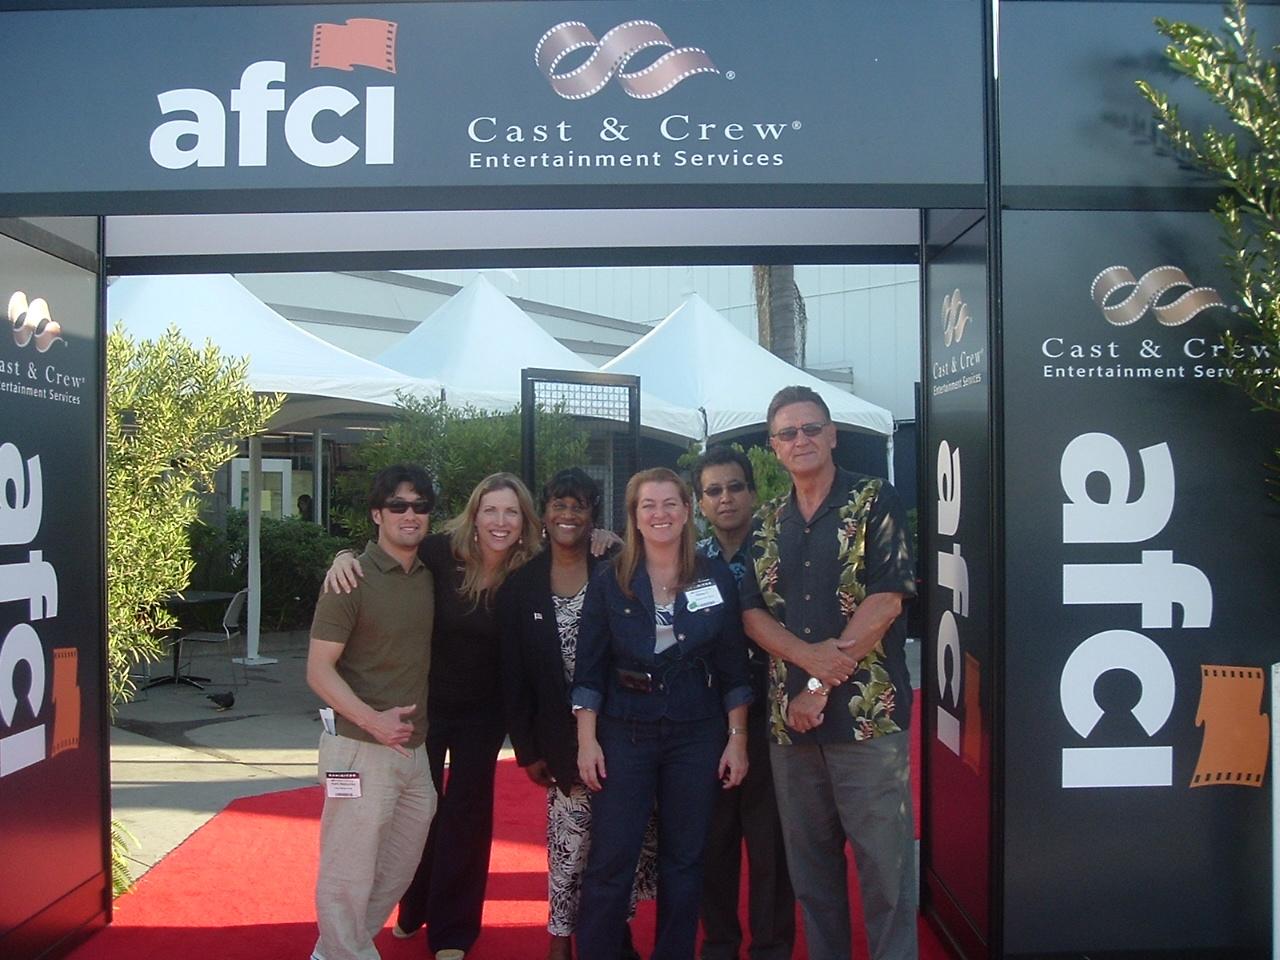 Kent Matsuoka with Hawaii State Film Commissoner, Donne Dawson; Benita Brazier, Maui; Walea Constantinau, Honolulu; Art Umezu, Kauai; and John Mason, Big Island. AFCI Location Trade Show, 2009.